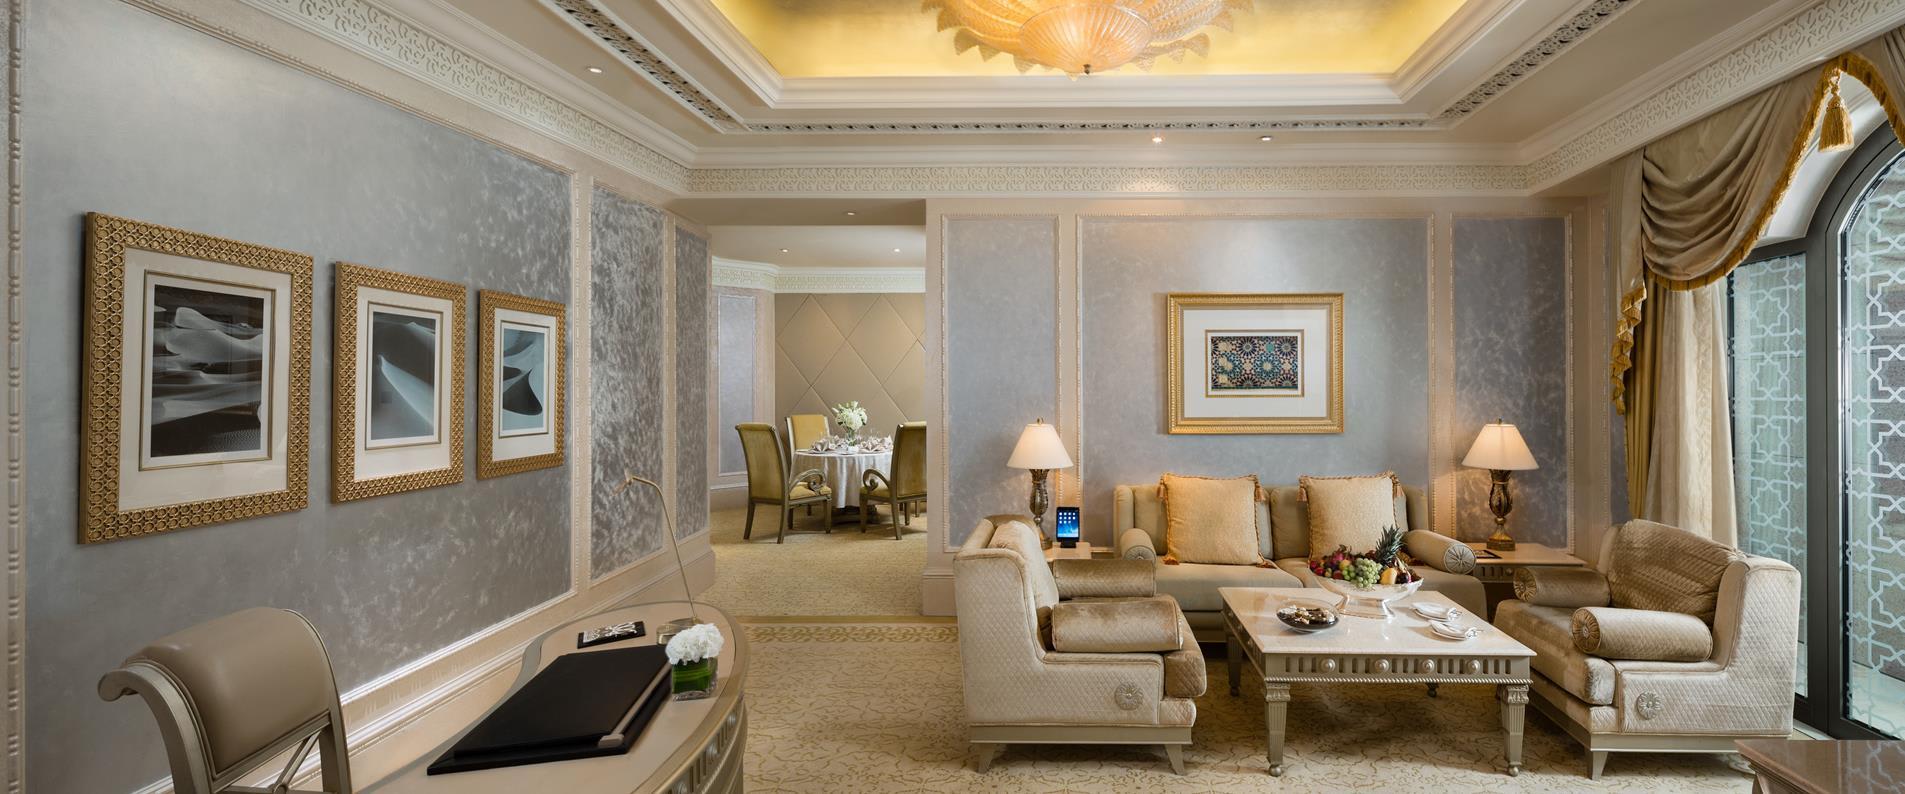 Khaleej Deluxe Suite living